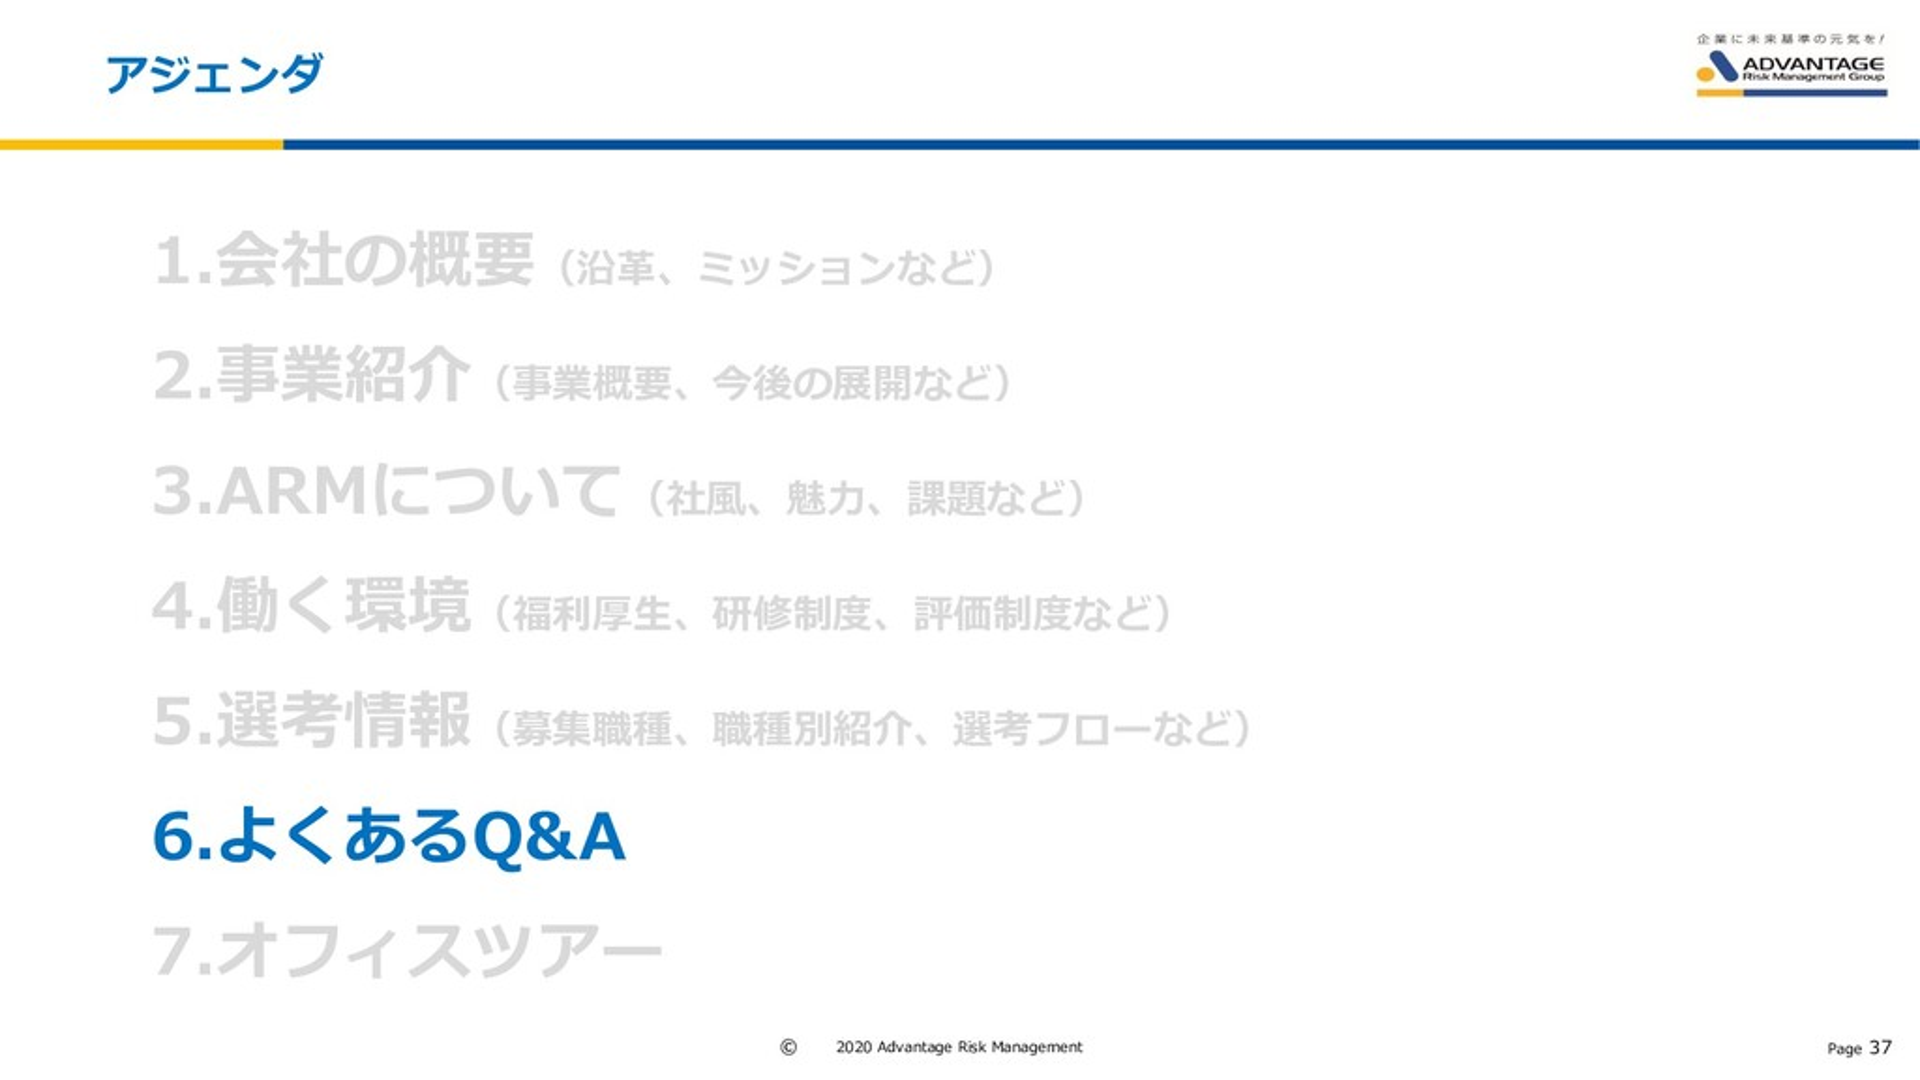 Page 37 2020 Advantage Risk Management © よくあるQ&...